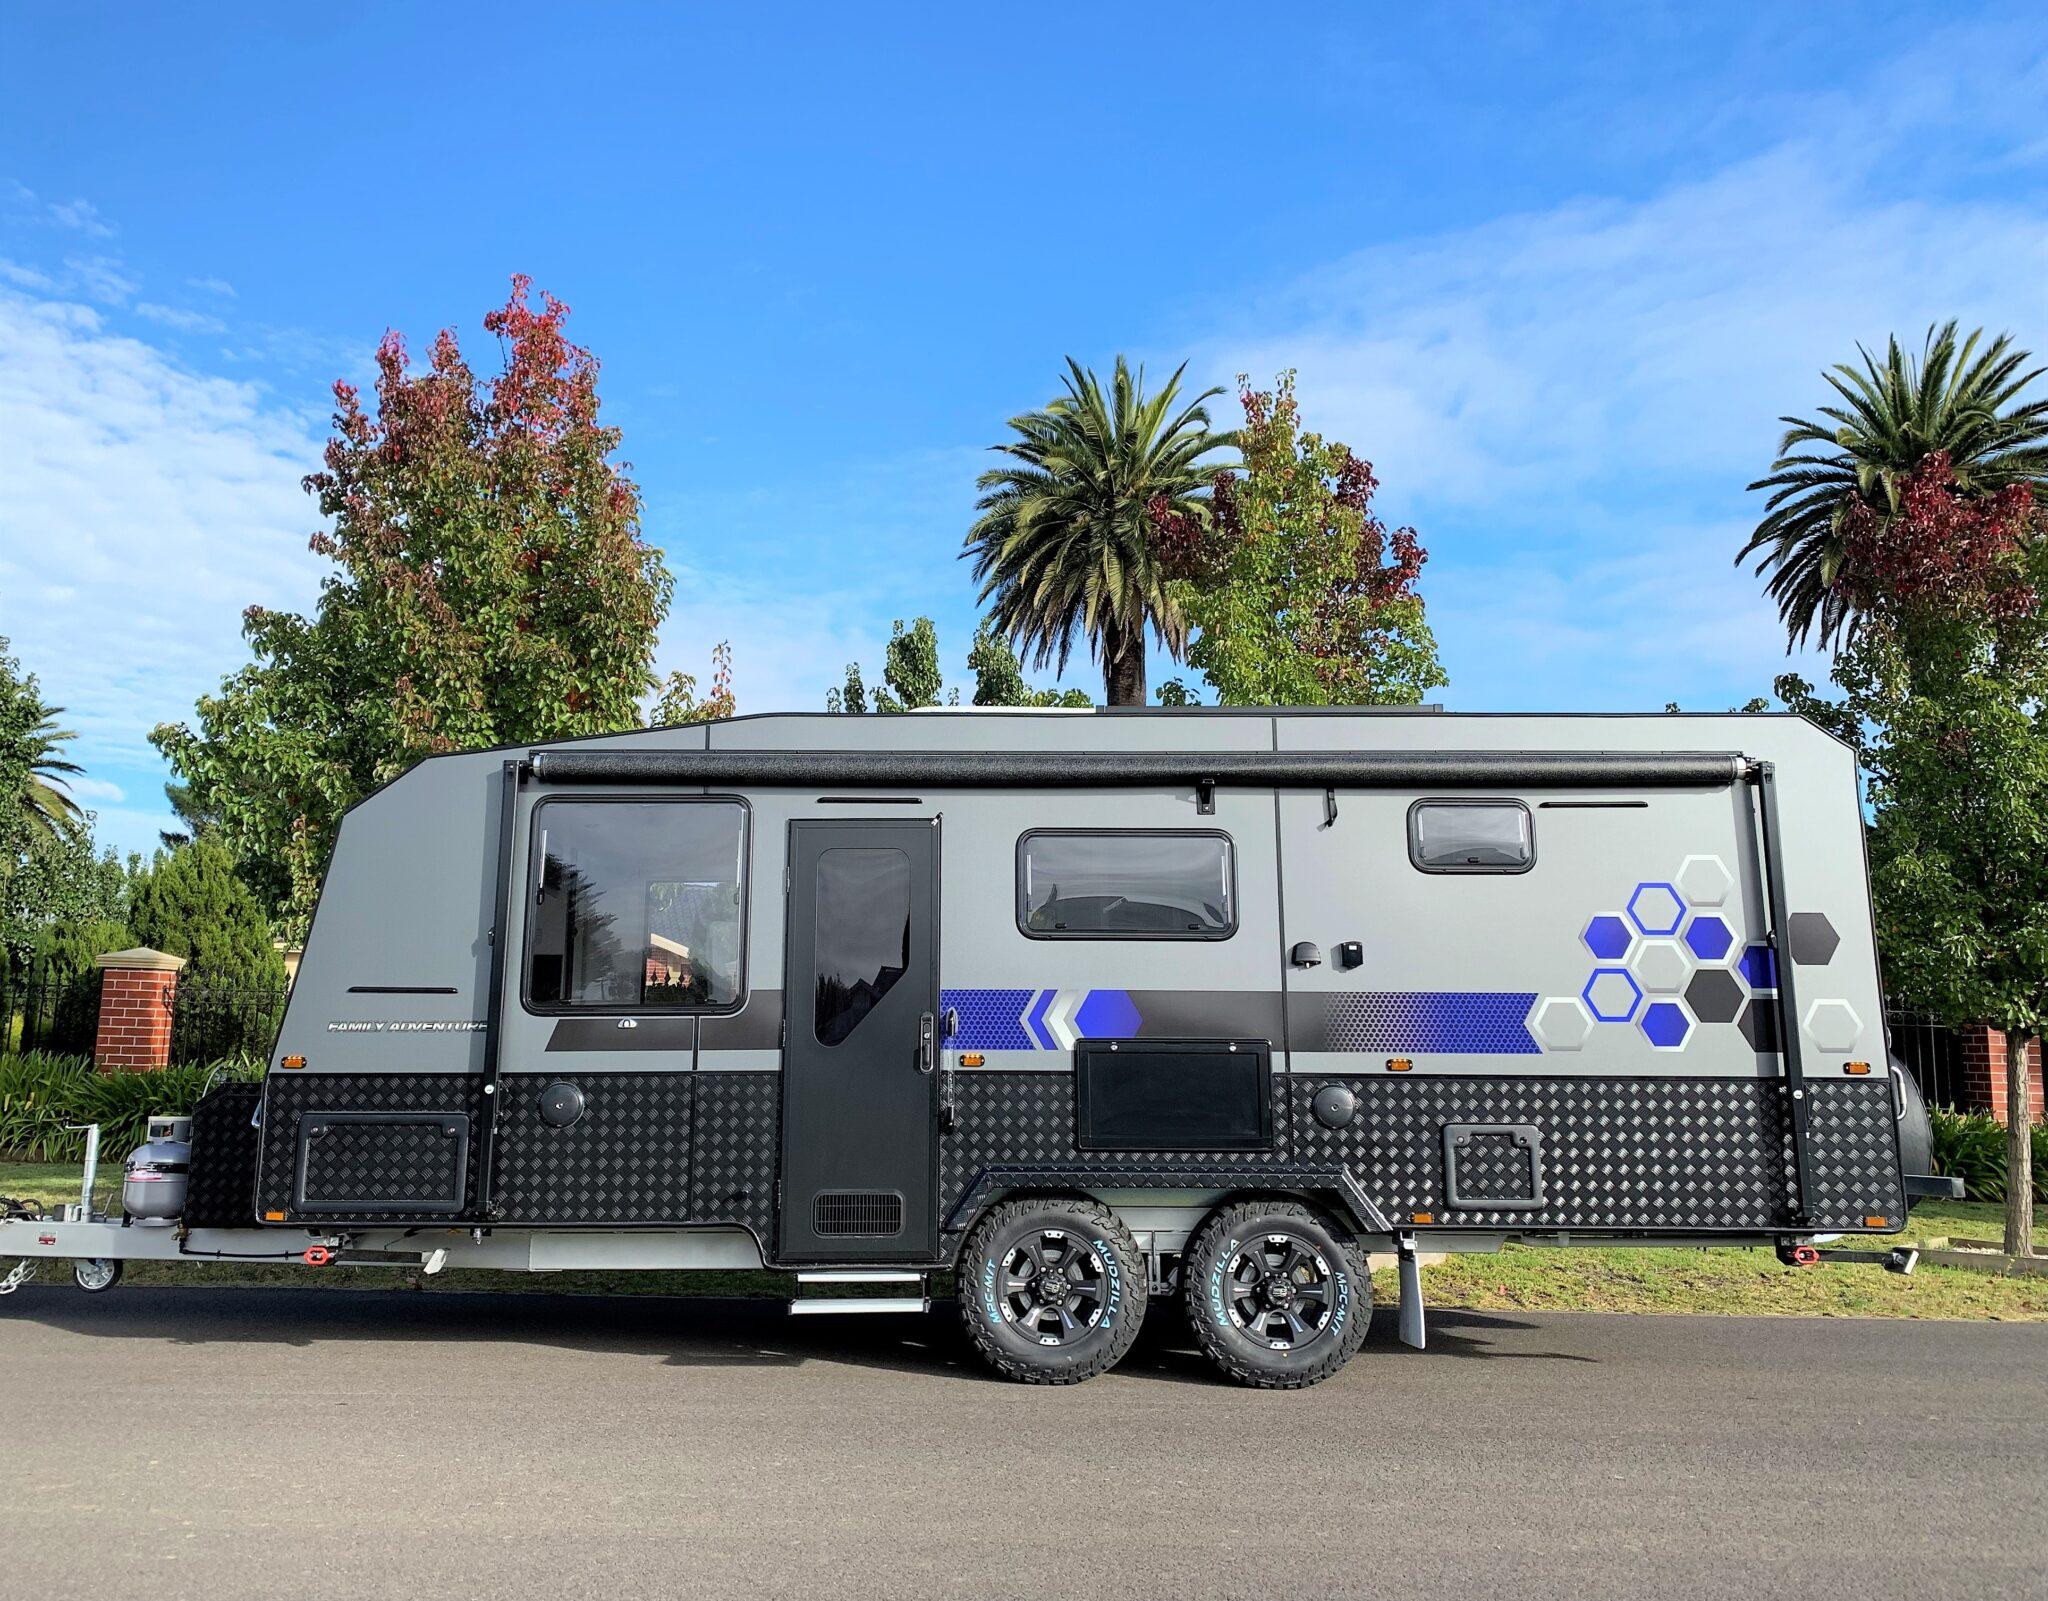 Brand new 2021 21'5 ft Malibu Family Adventure semi off road 4 berth shower and toilet double bunk caravan